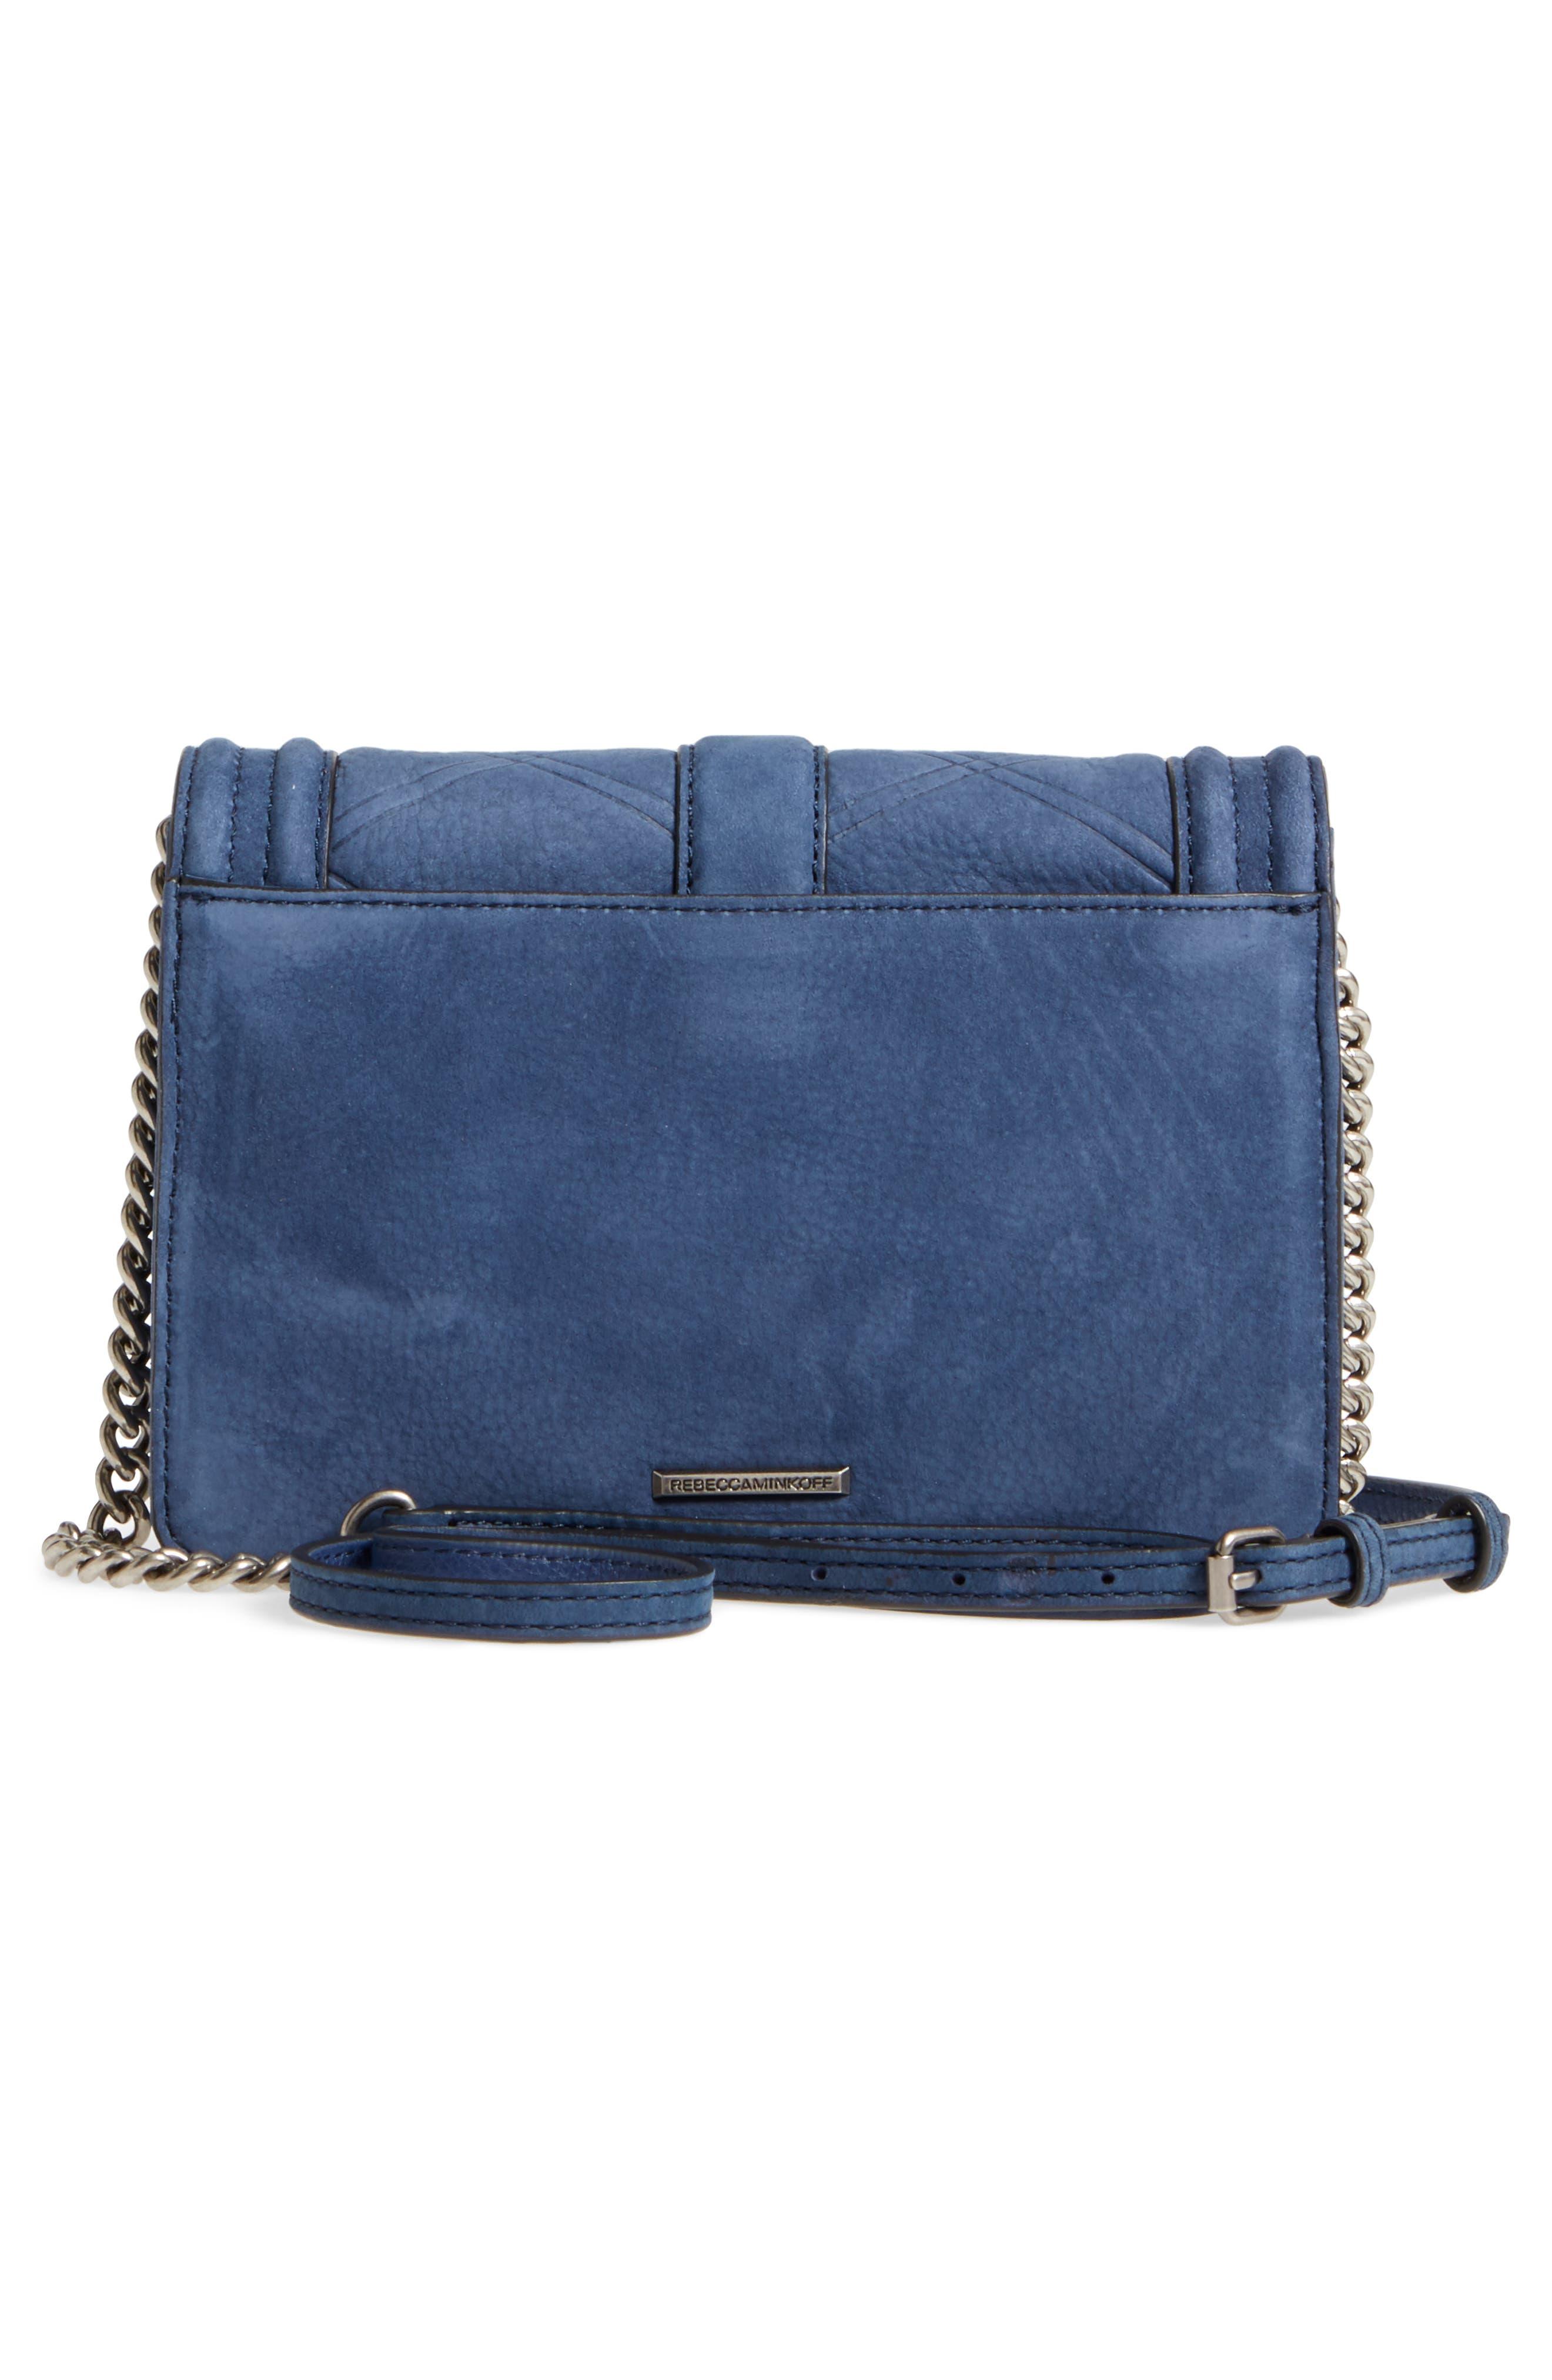 Small Love Nubuck Leather Crossbody Bag,                             Alternate thumbnail 3, color,                             True Navy